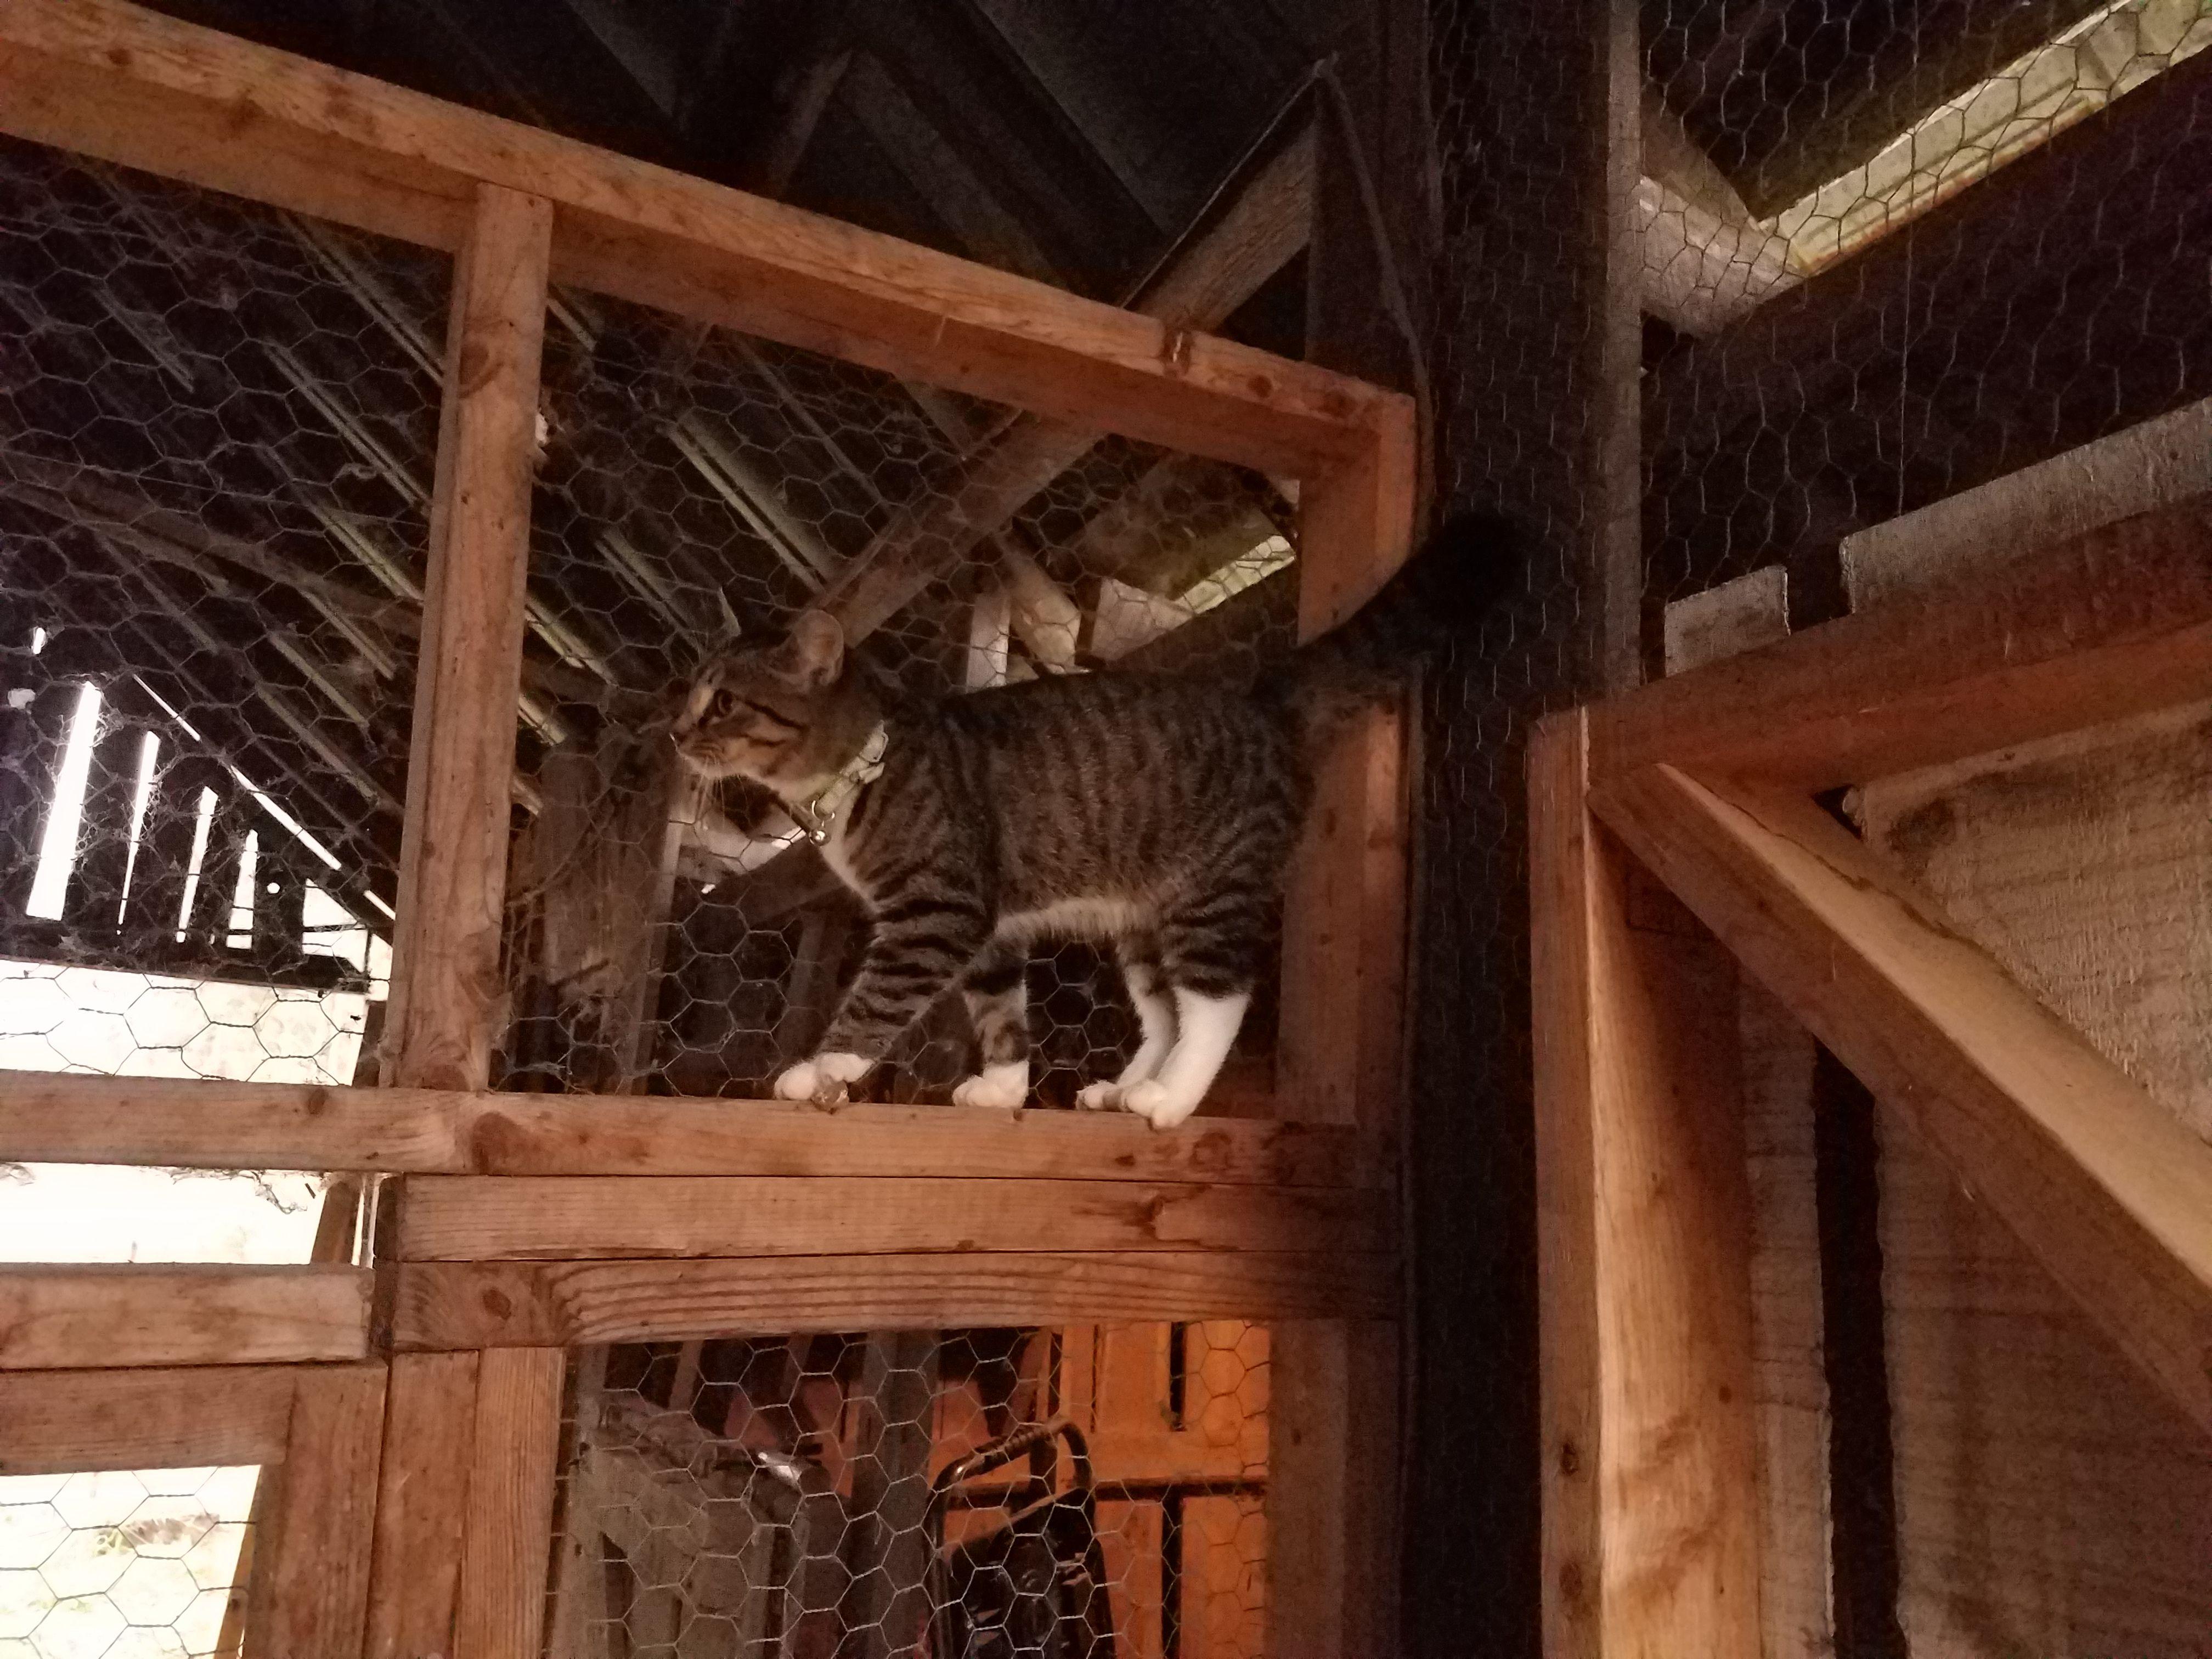 Barn Cat Balance Walking Across Stall Divider